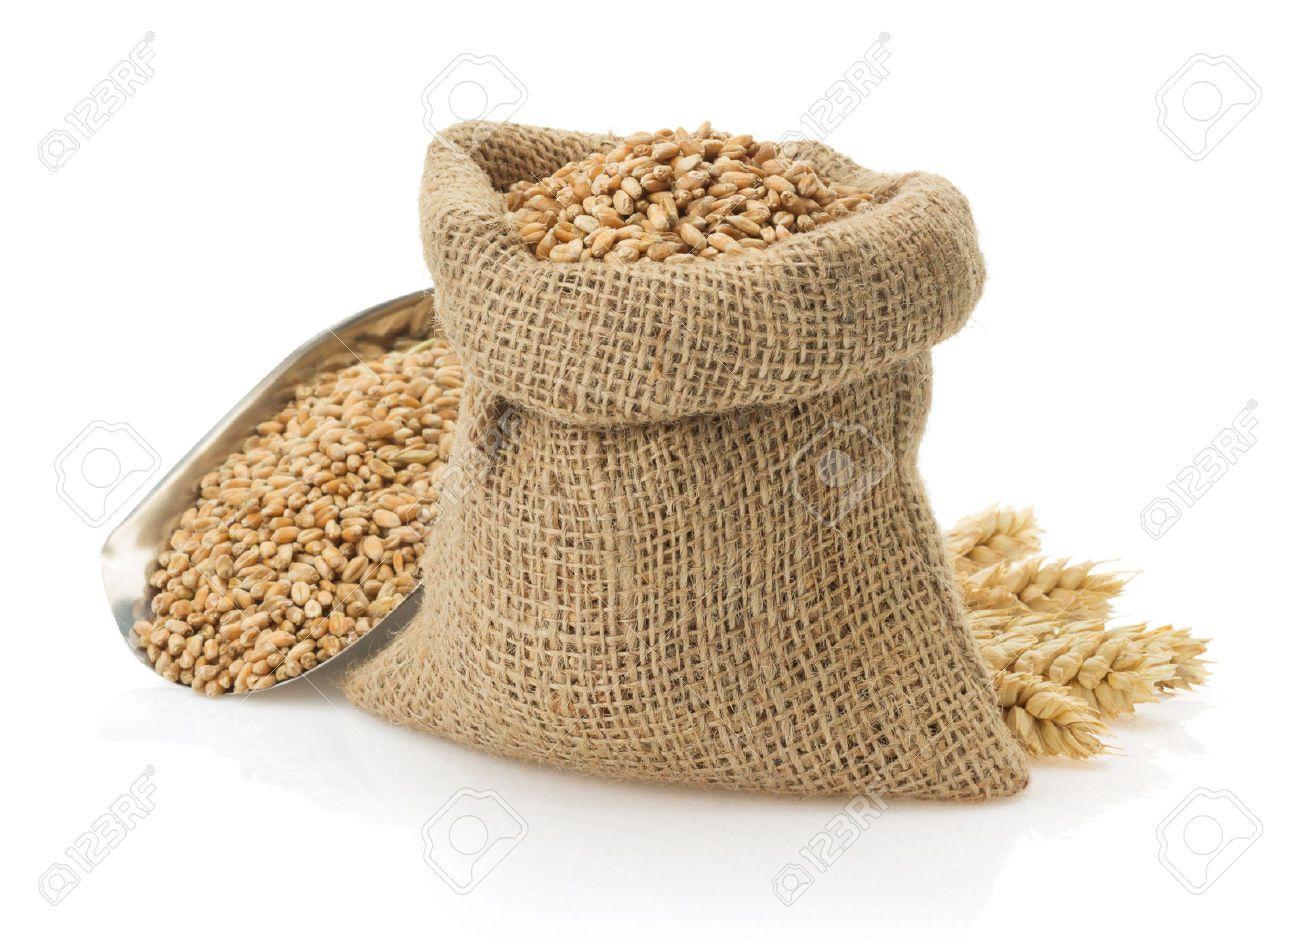 Flour sack pencil and. Grains clipart grain bag